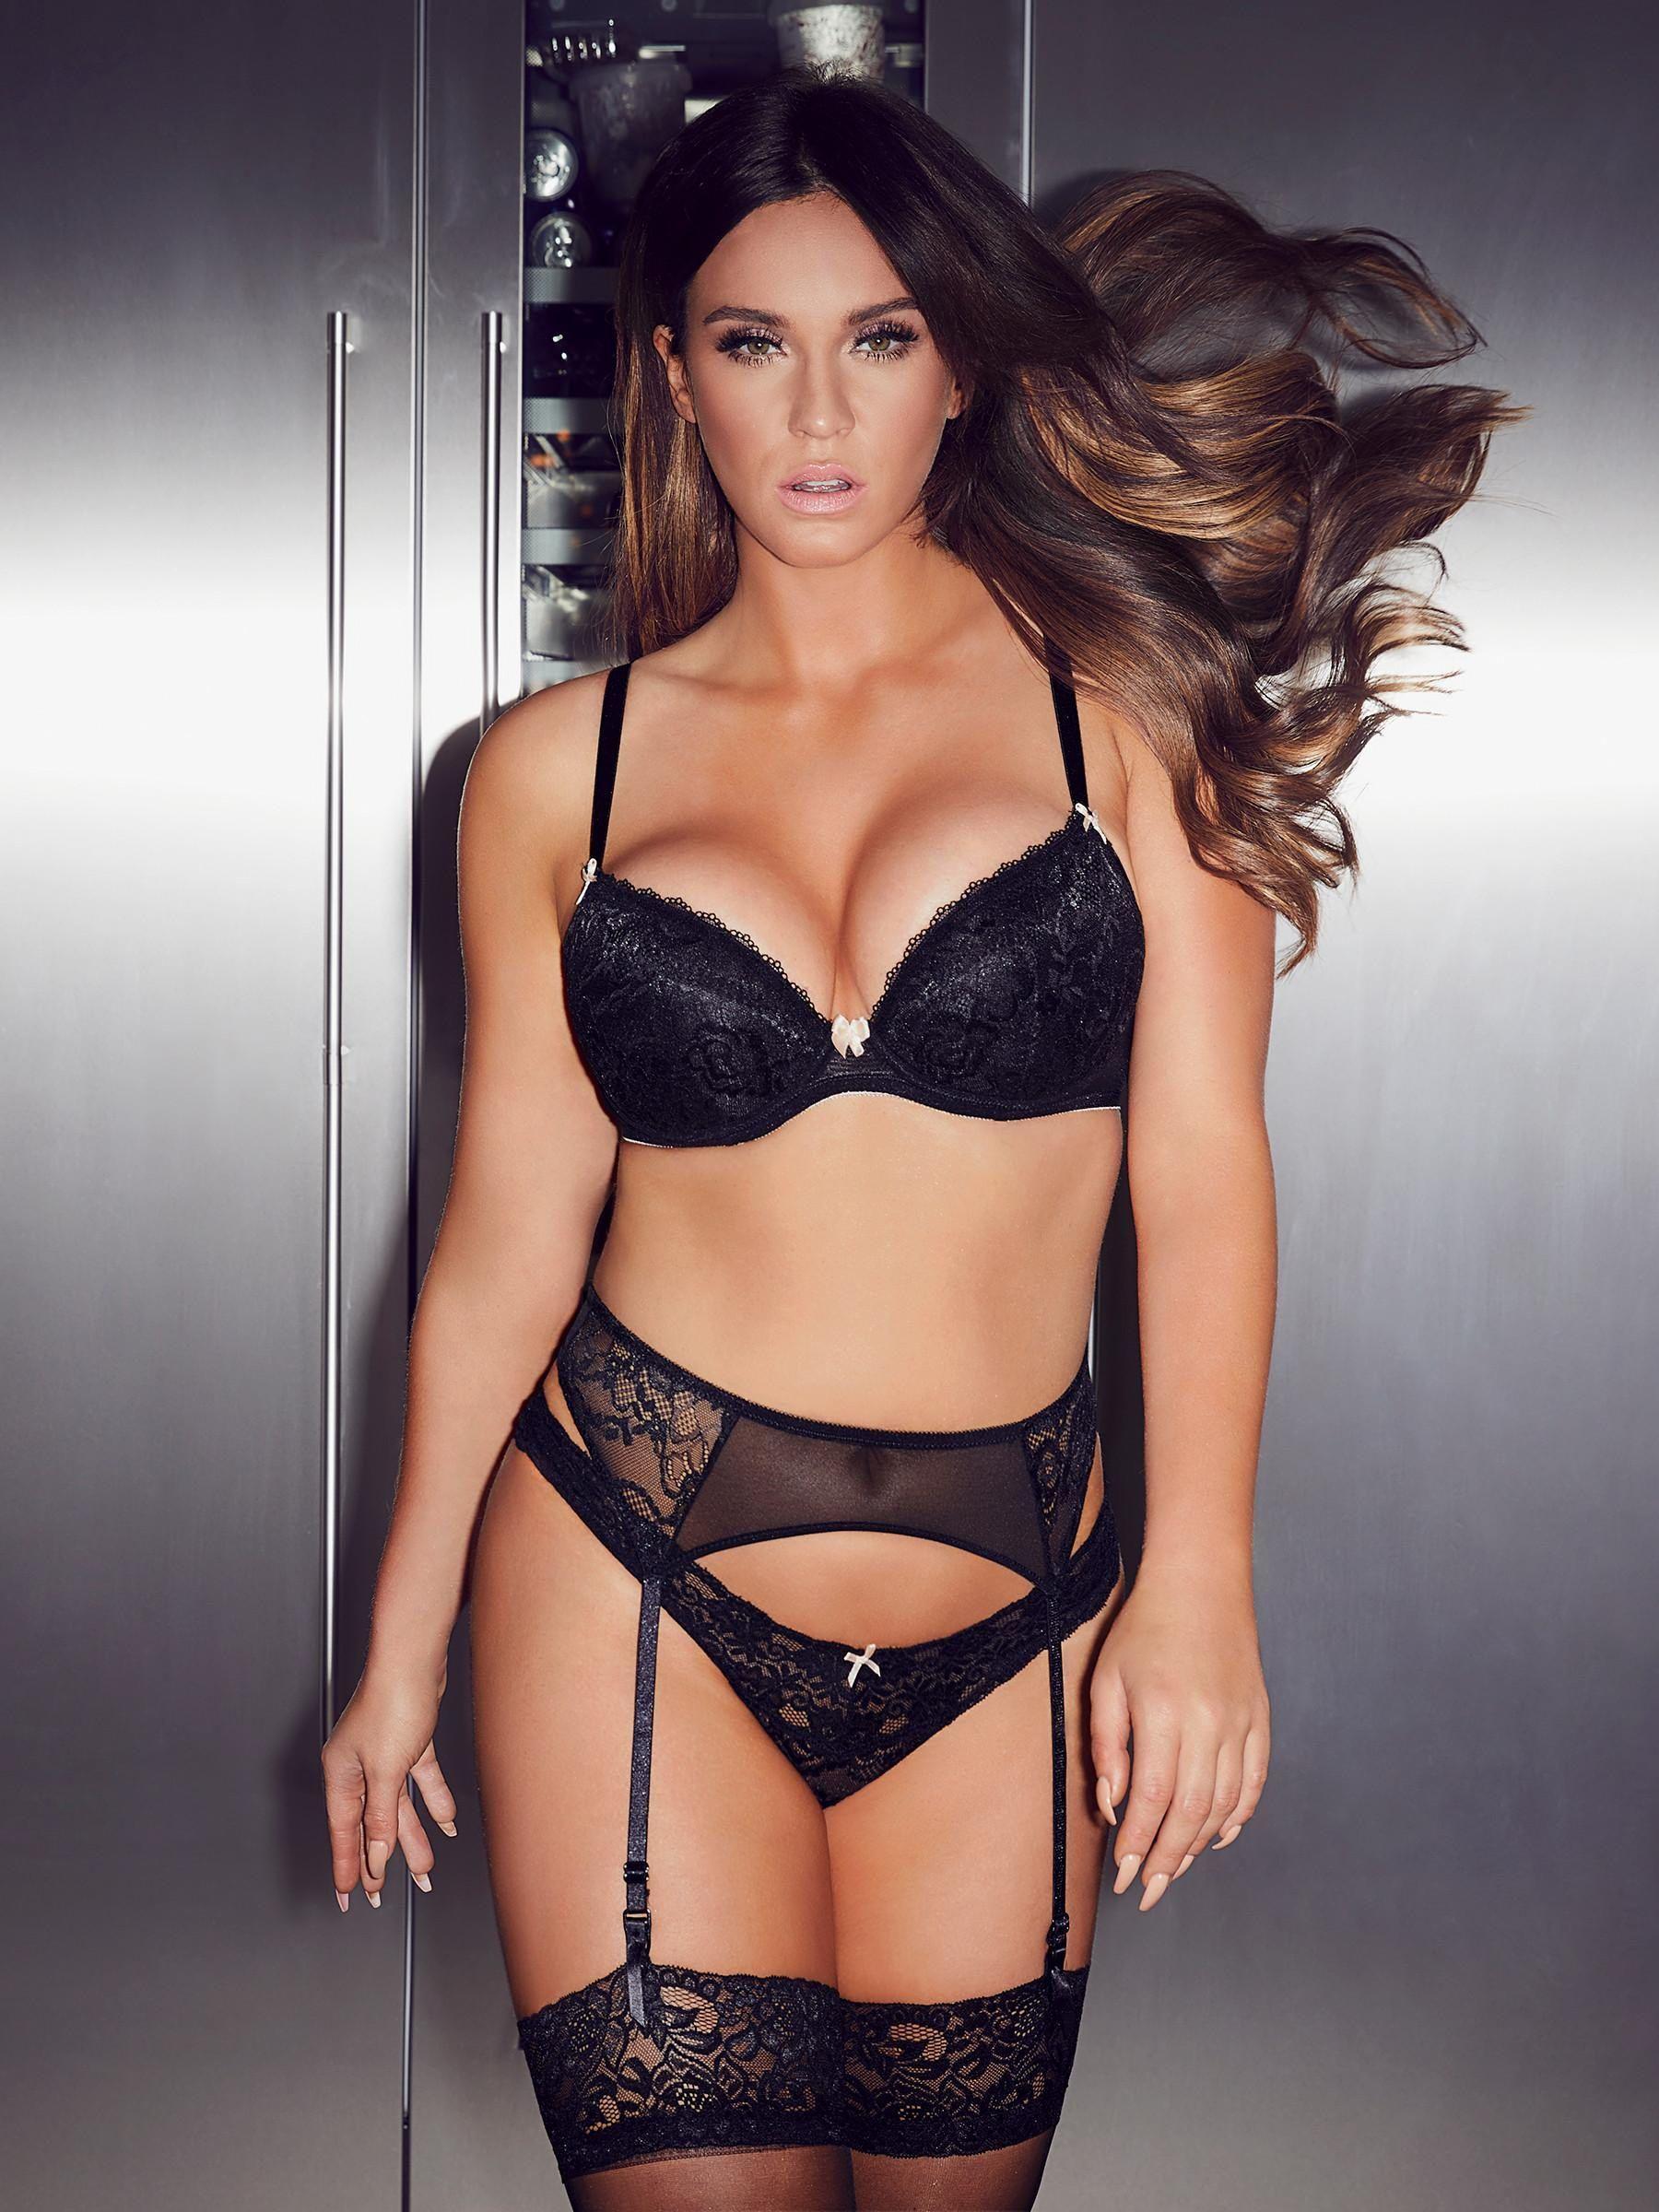 Amelia Arnau see through. 2018-2019 celebrityes photos leaks!,Meri gulin ass Erotic pics & movies Cindy Mello hot,The art issue lovecat magazine